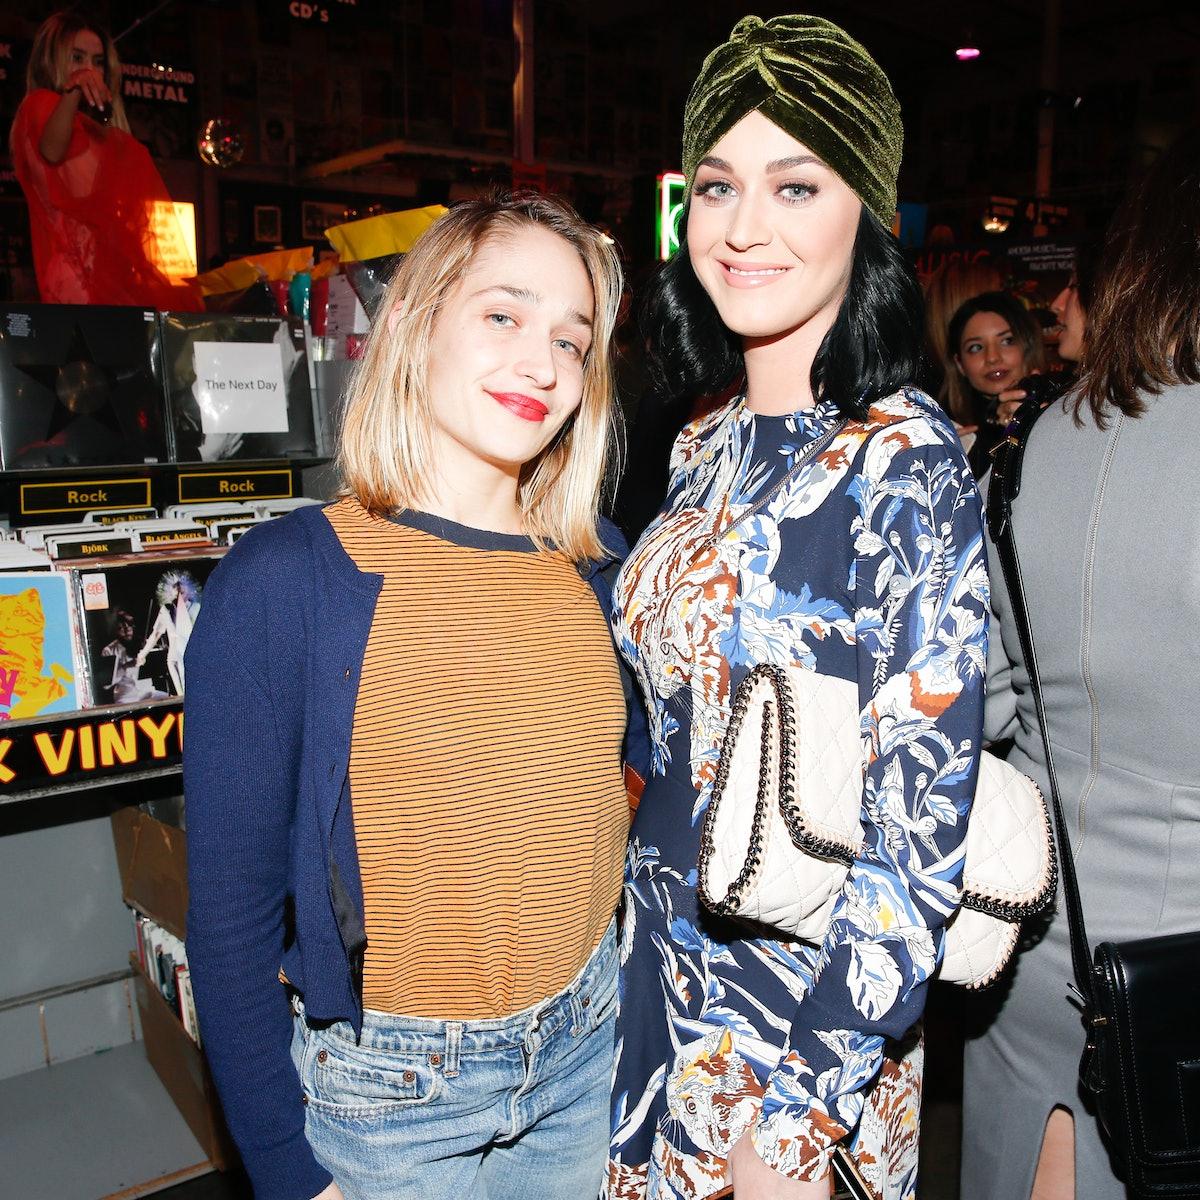 Jemima Kirke and Katy Perry